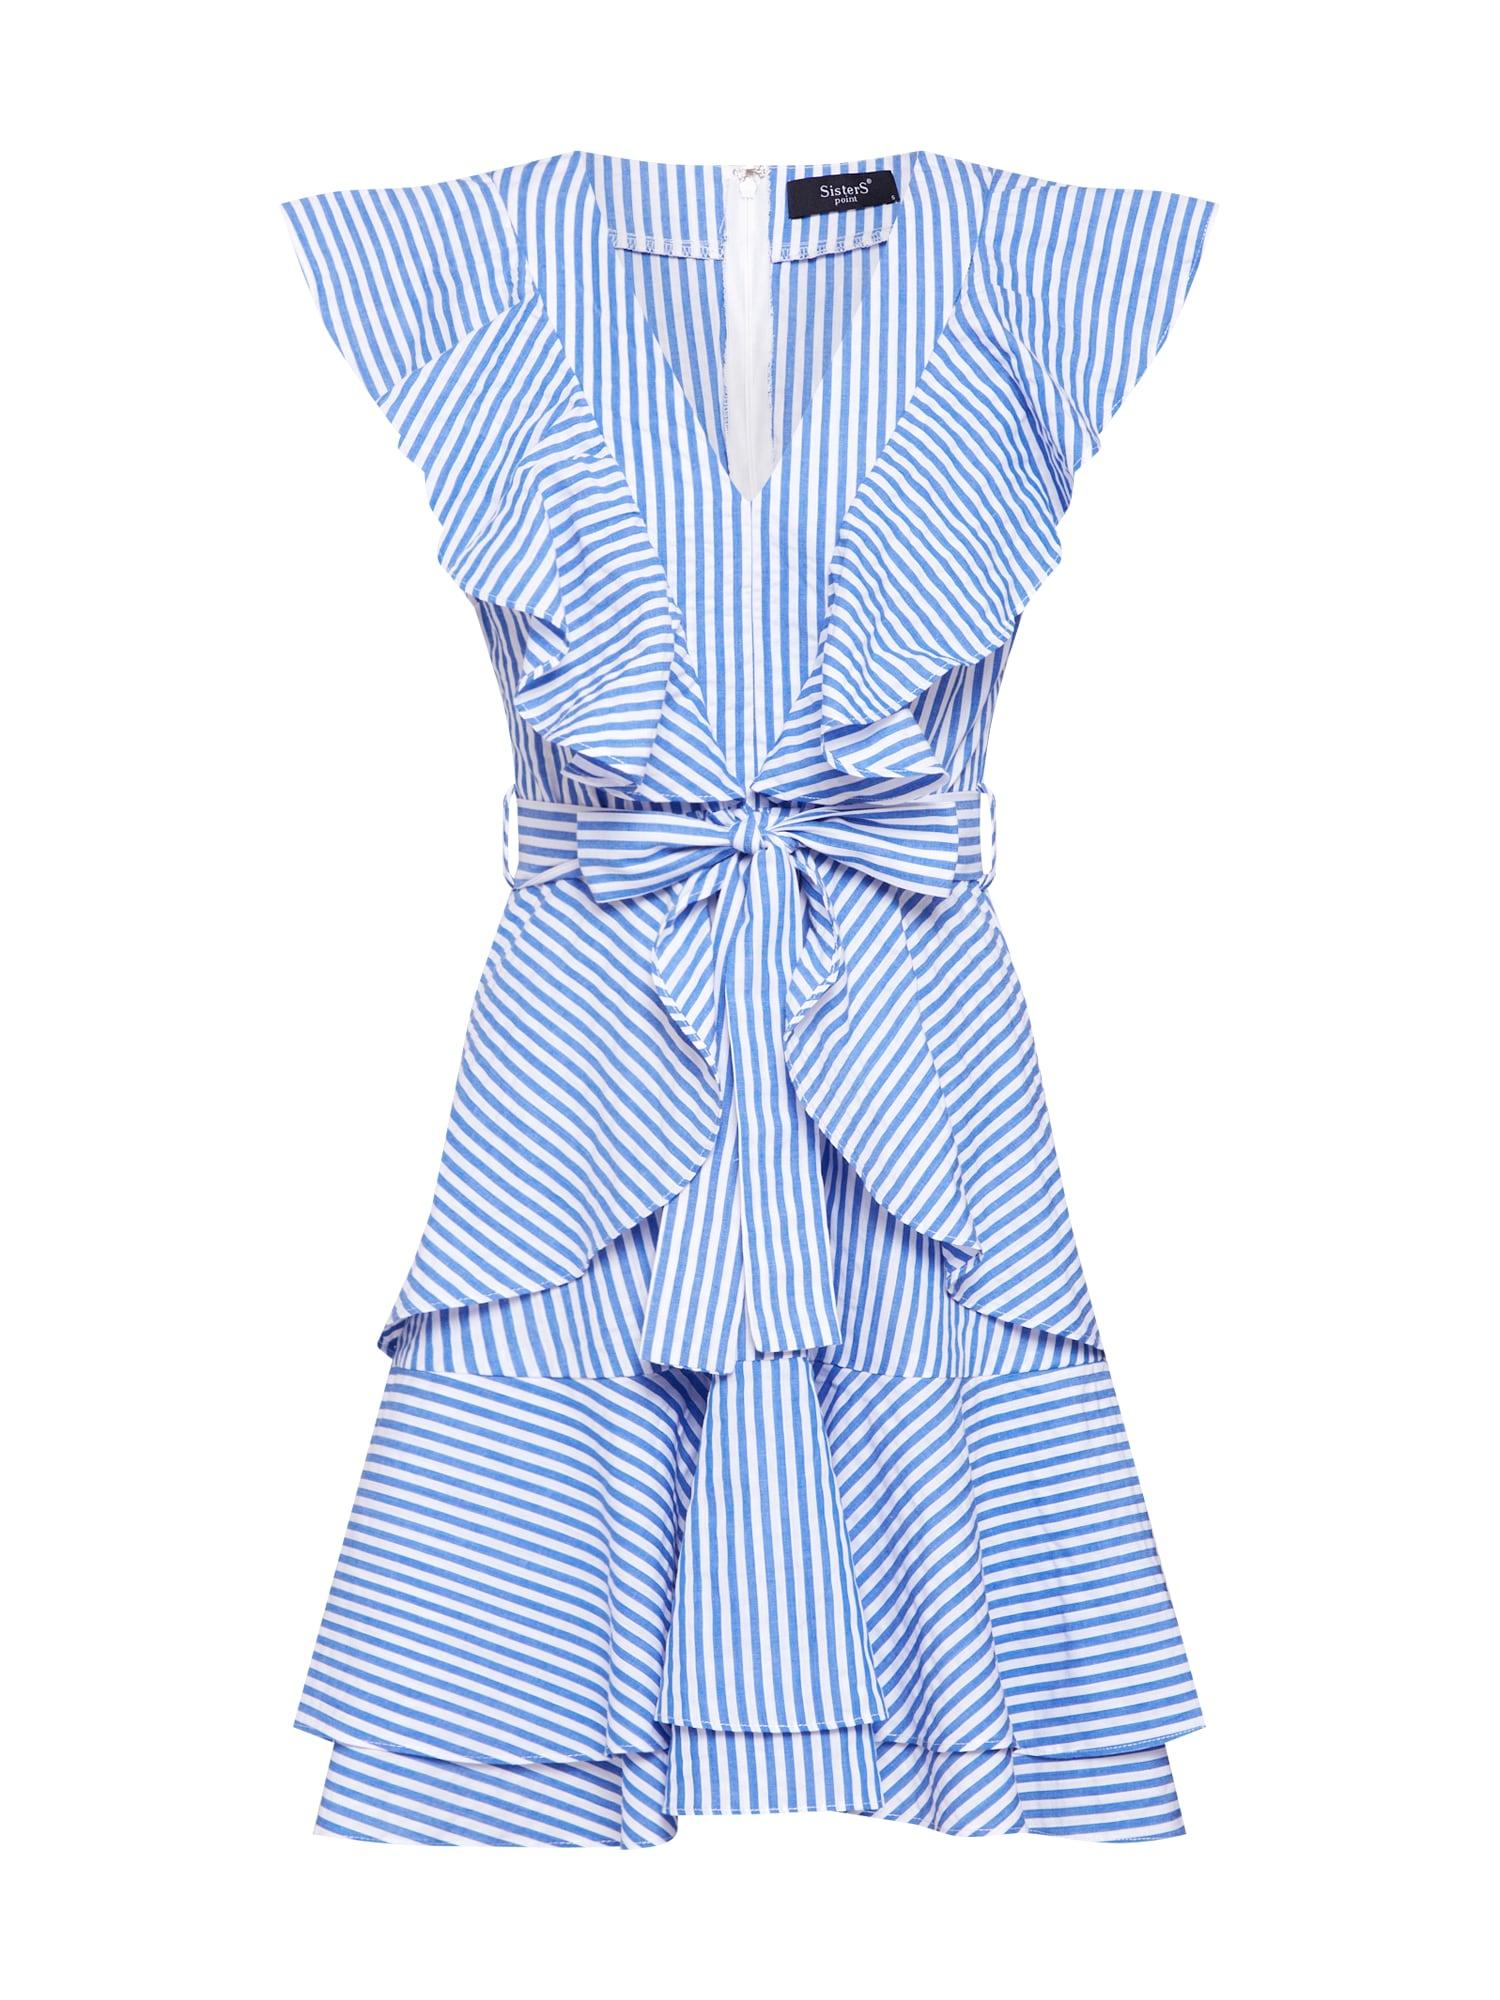 Letní šaty EVAN-DR modrá bílá SISTERS POINT